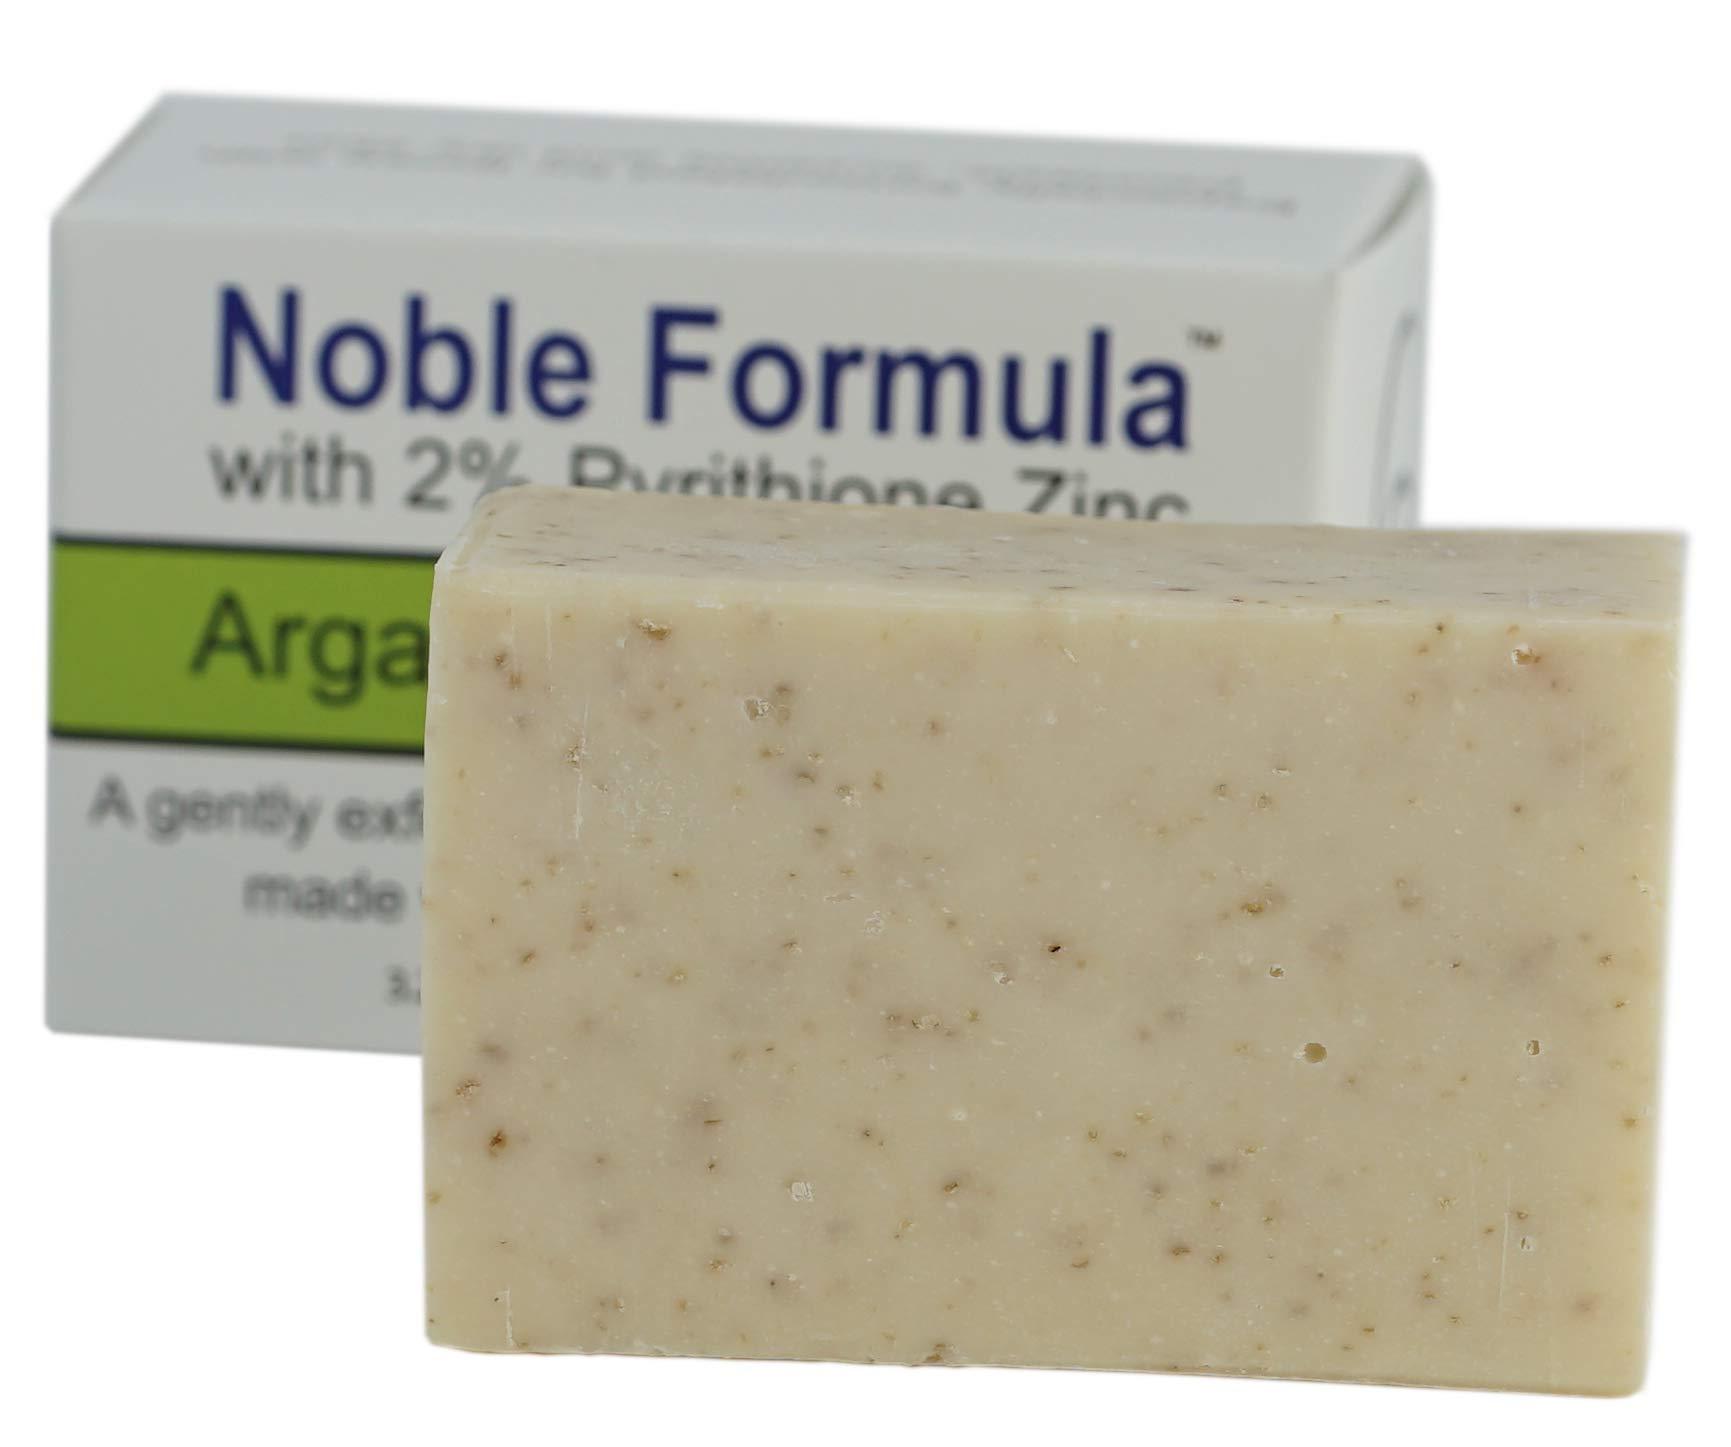 Noble Formula 2% Pyrithione Zinc (ZnP) Argan Oil Bar Soap, (3 Bars in 1 Box), Total 9 oz